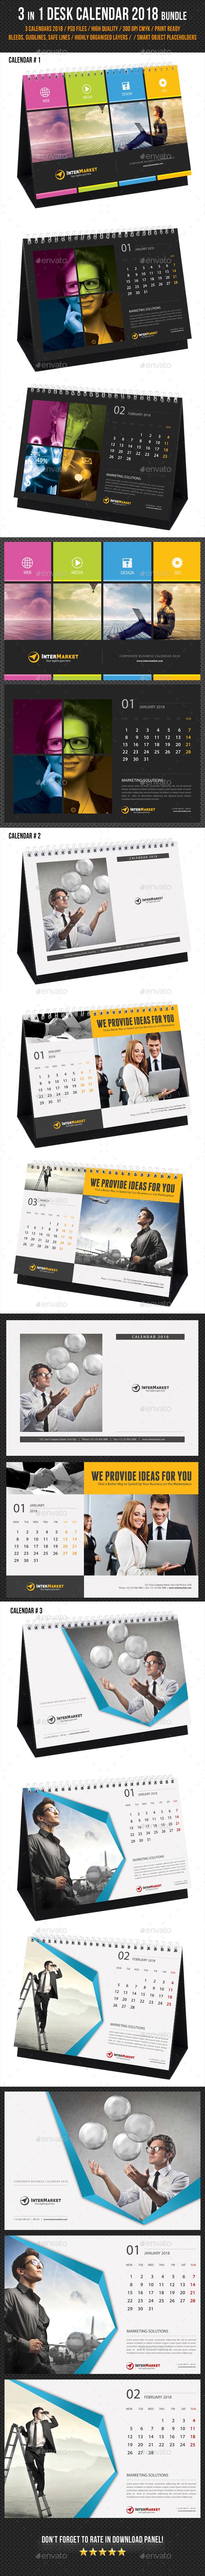 3 in 1 Corporate Desk Calendar 2018 Bundle - Calendars Stationery